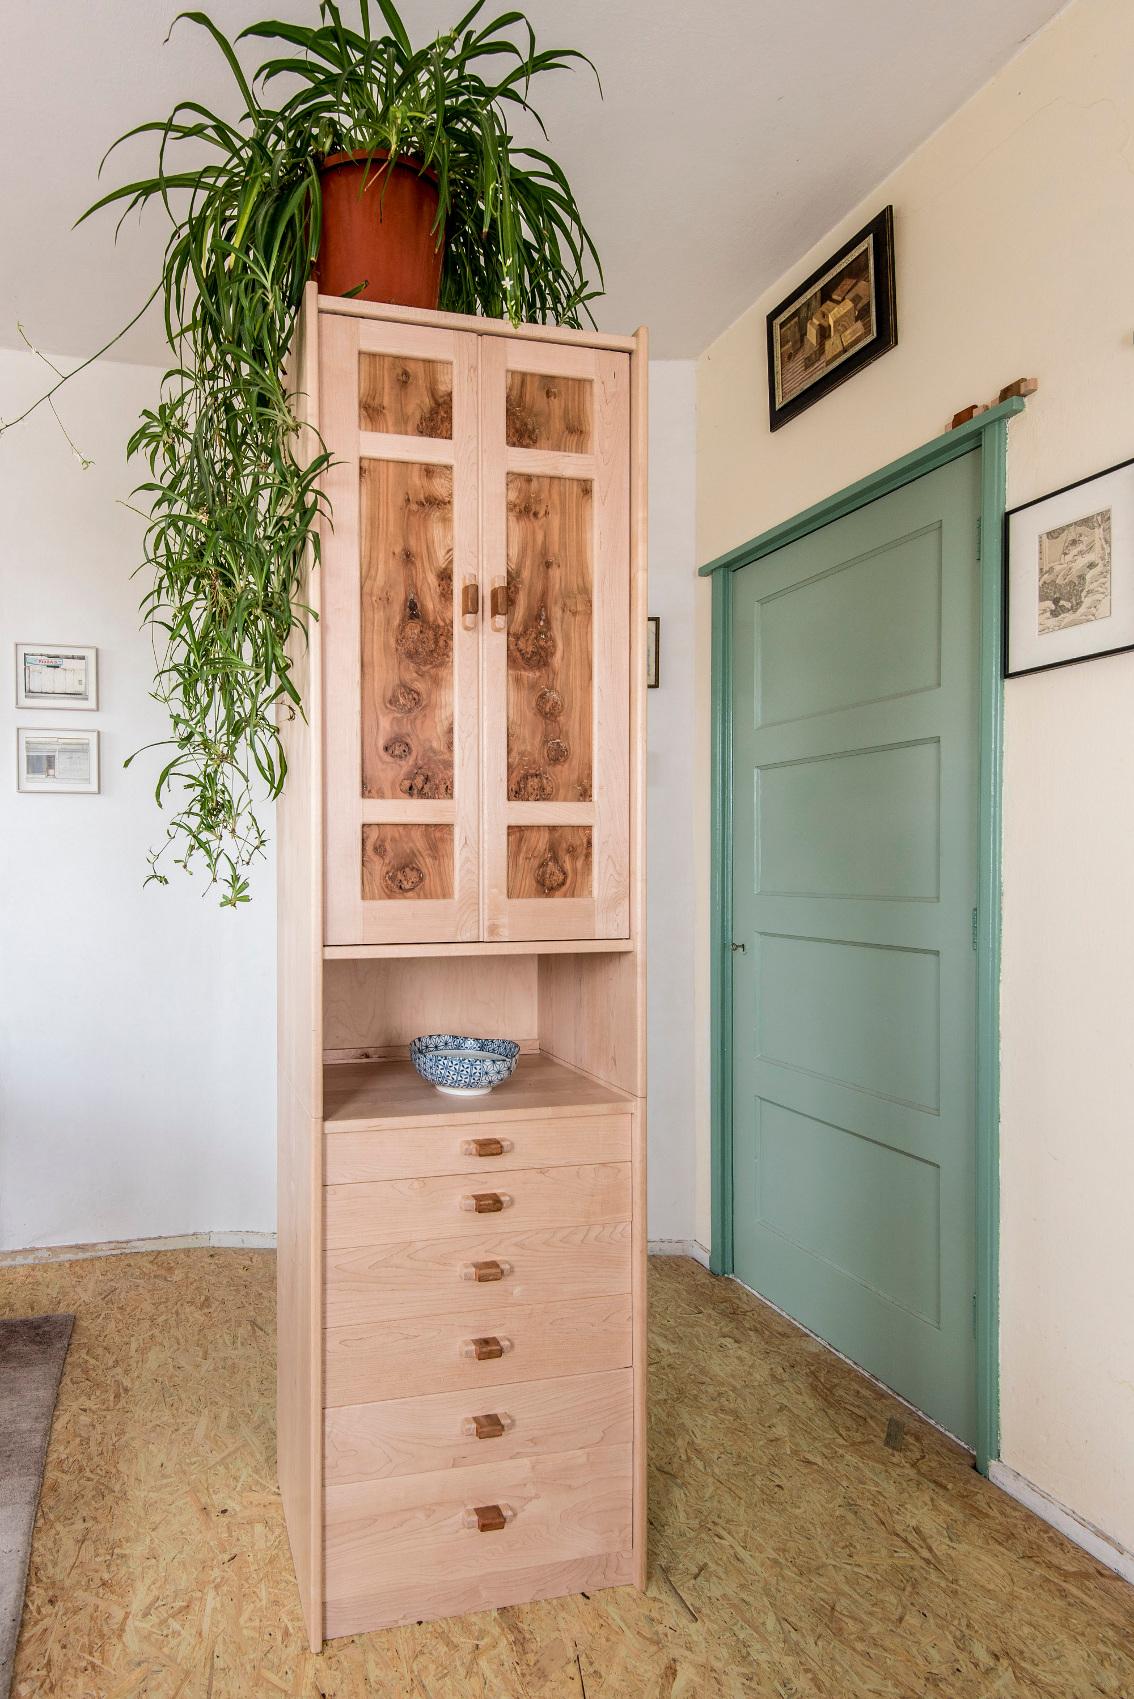 Hoge kast met paneeldeuren   Hanneke Everts meubels